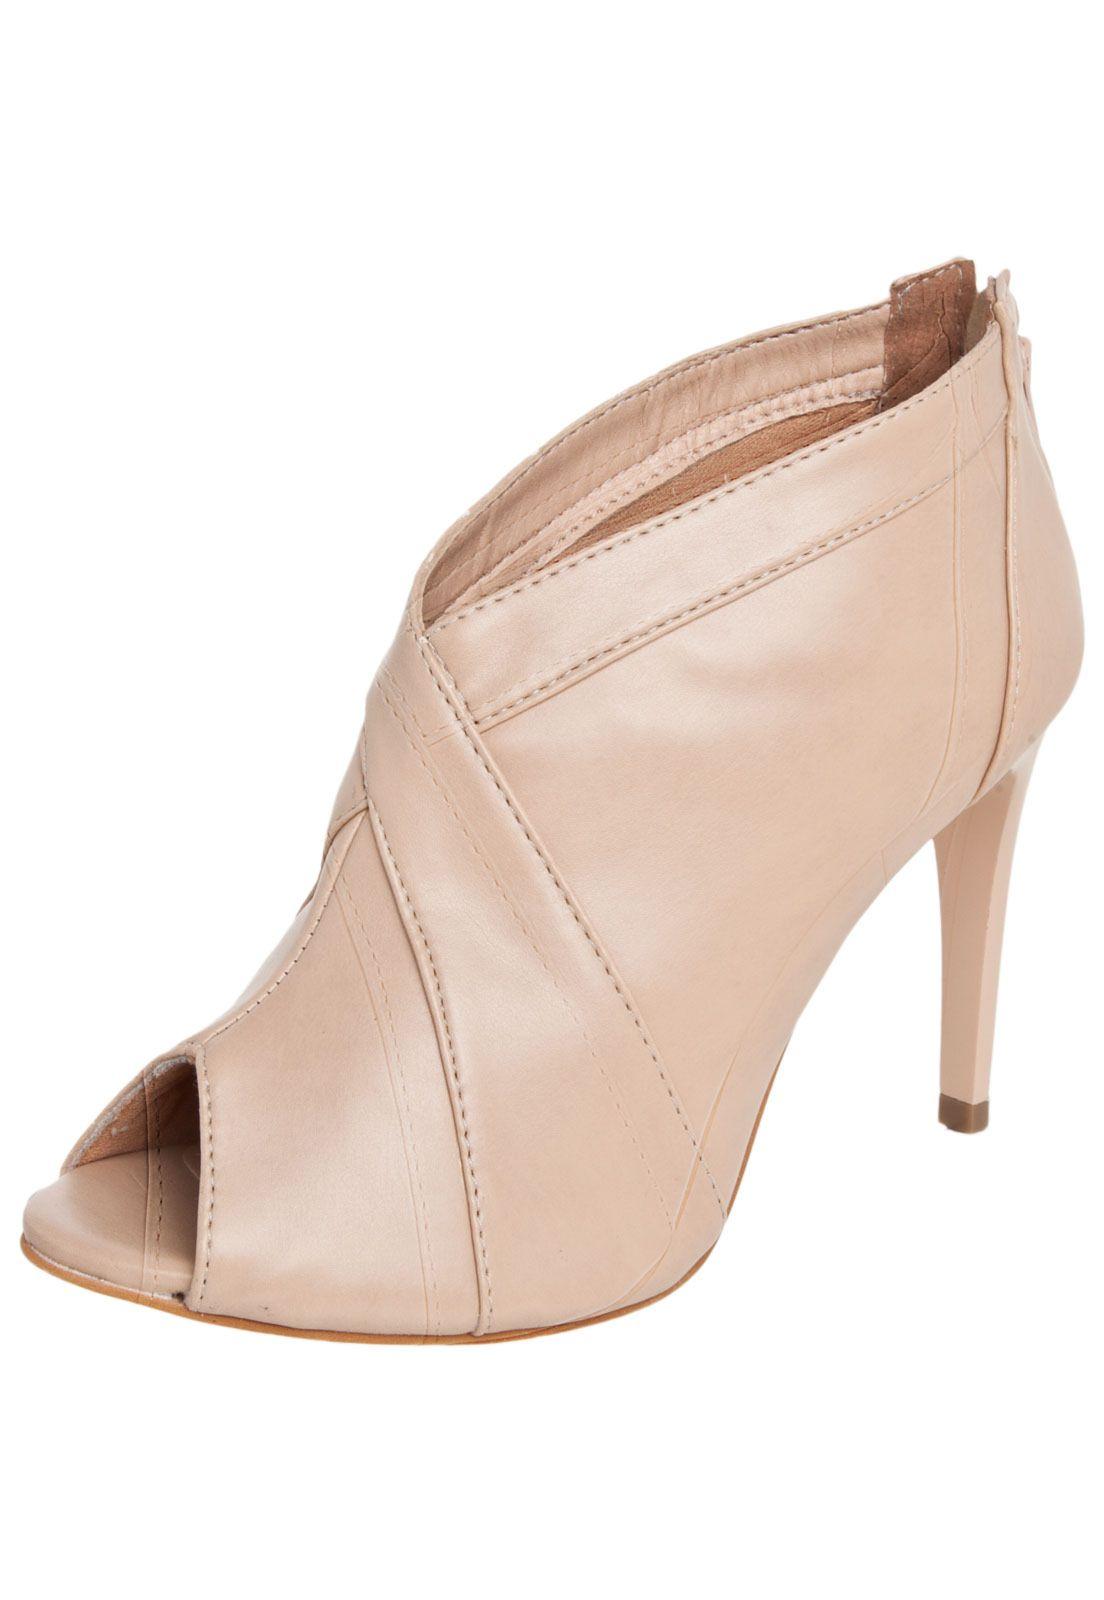 34b462640 Ankle Boot DAFITI SHOES Nude - Compre Agora   Dafiti Brasil   Bolsas ...